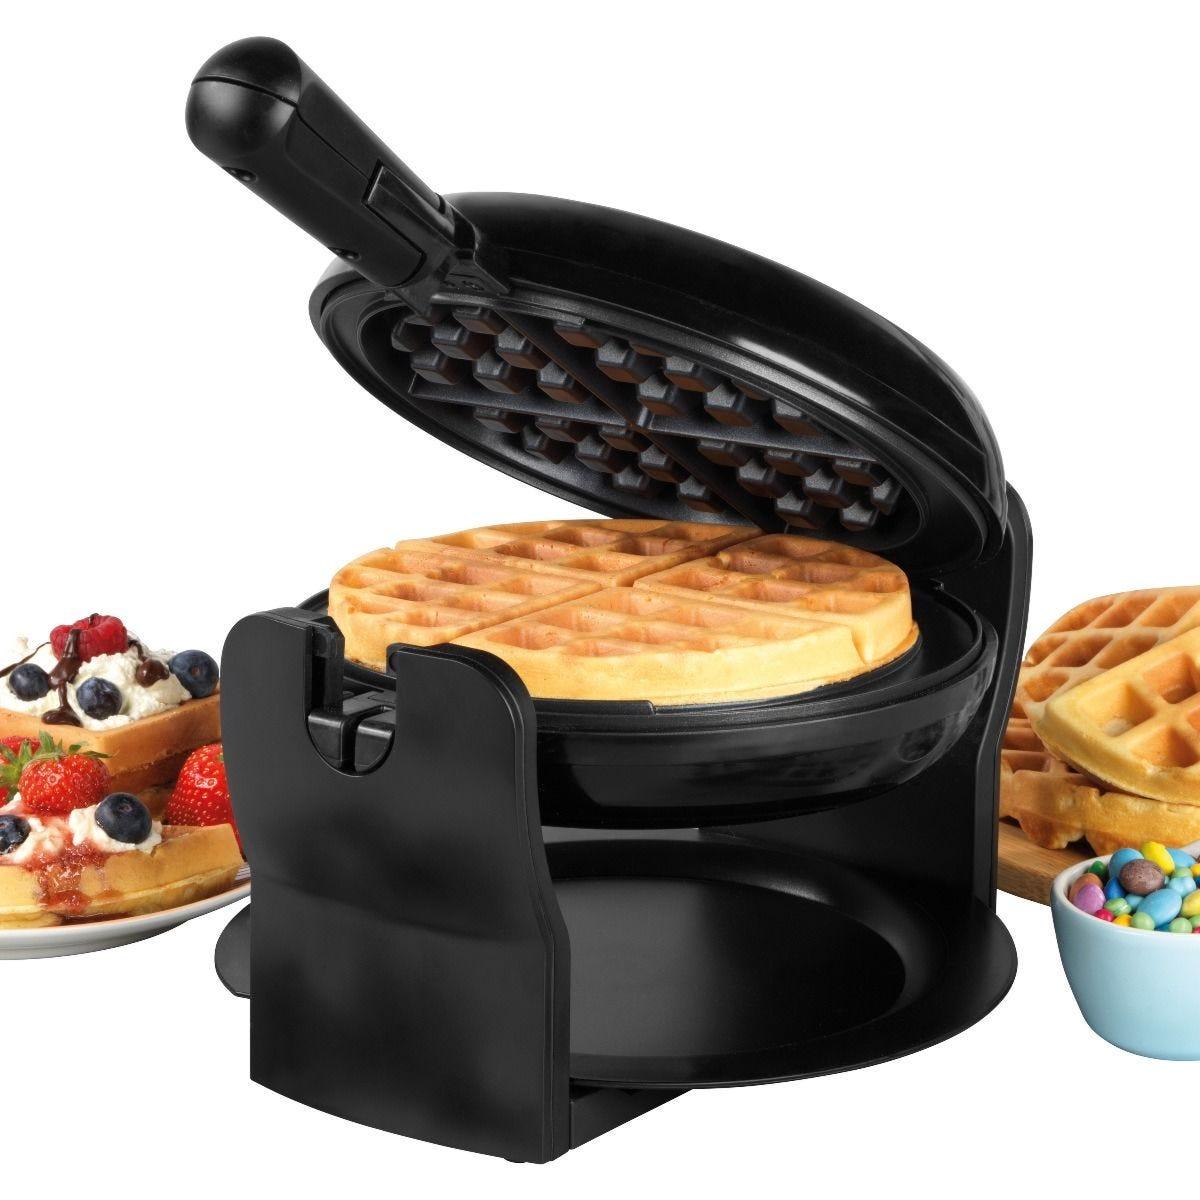 Progress EK4376P 1000W Rotary Non- Stick Waffle Maker - Black